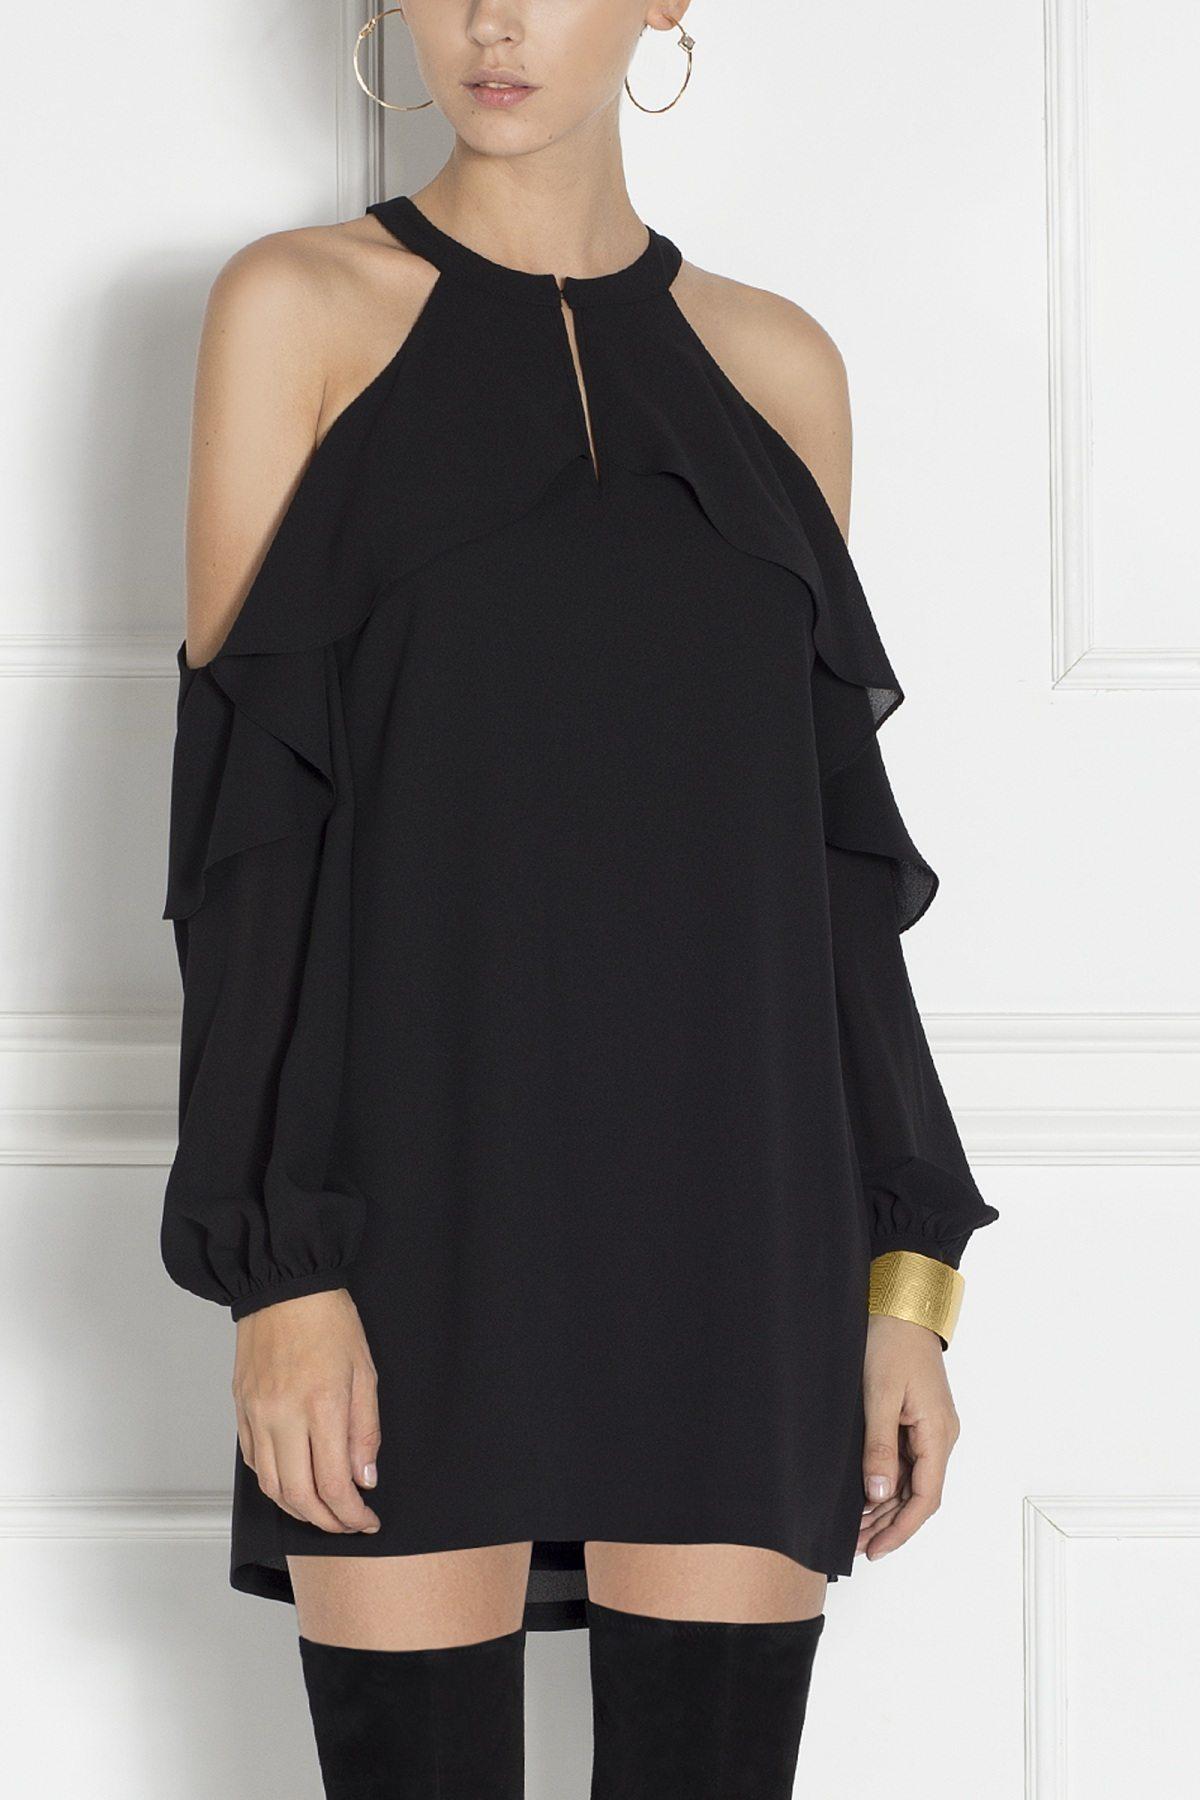 Rochie de seara mini cu mesa de voal transparent Negru